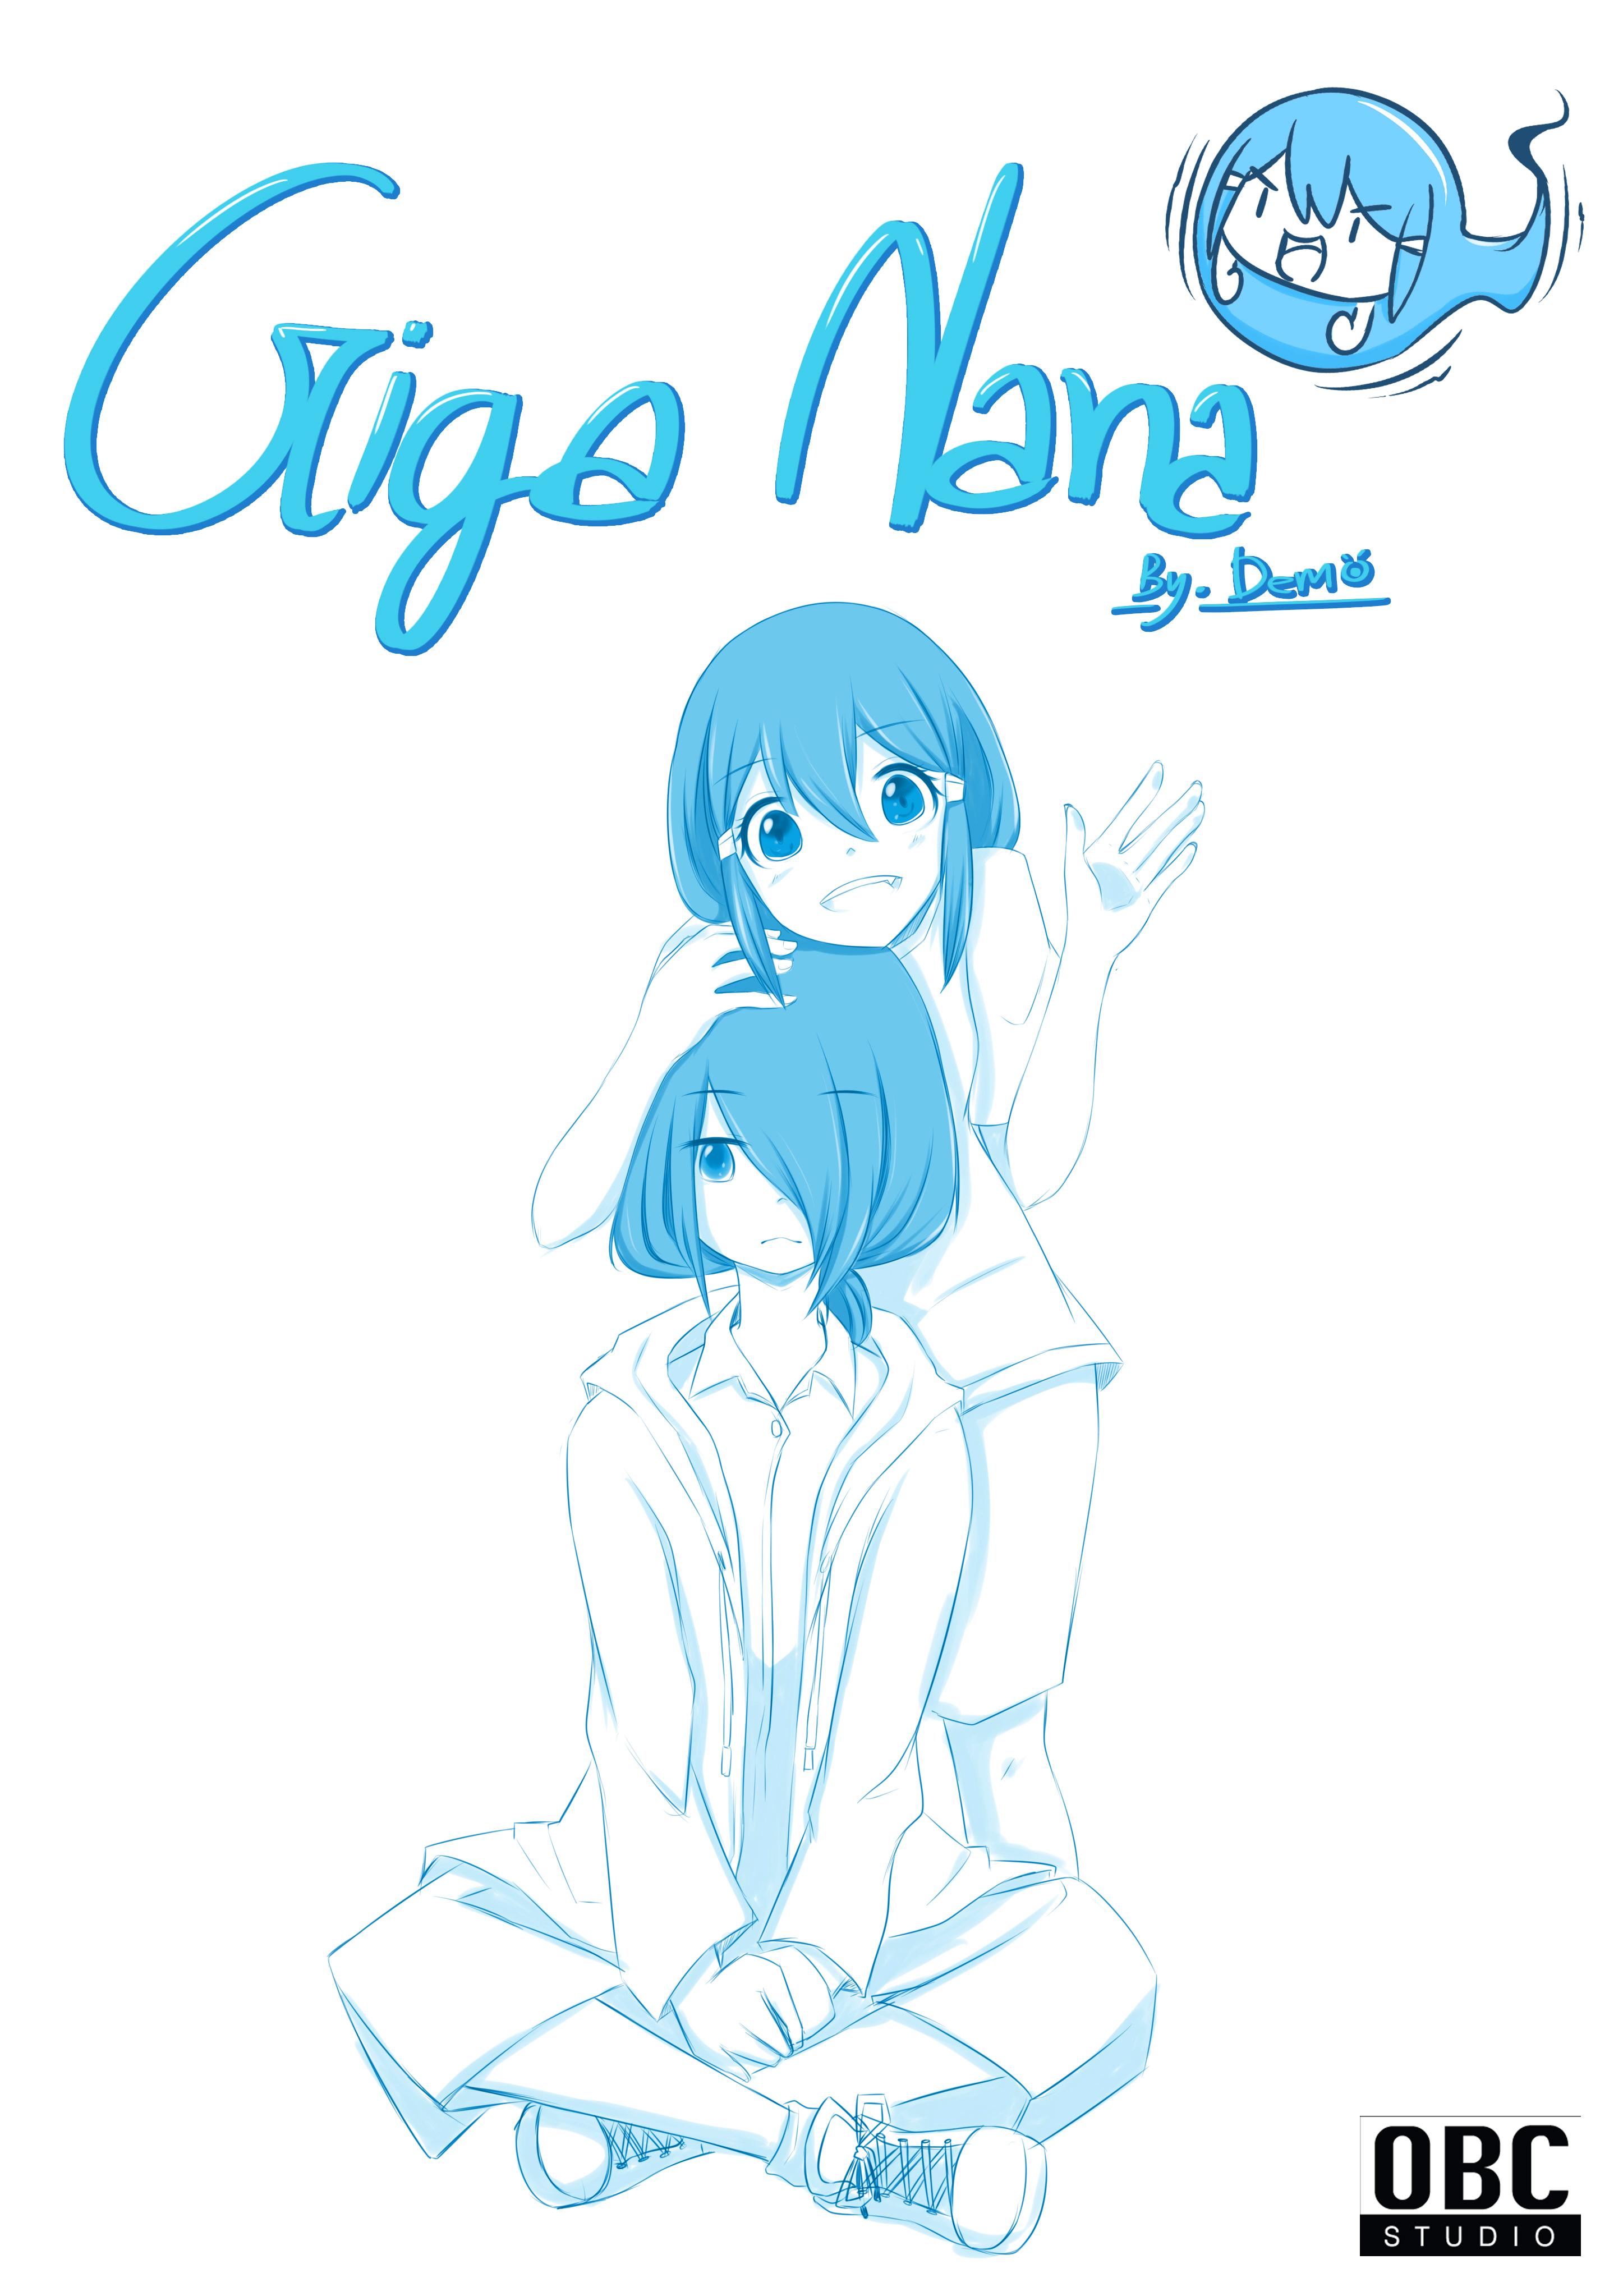 Giga Nana (ผีรักทุกนาเธอ คอนเทสต์)